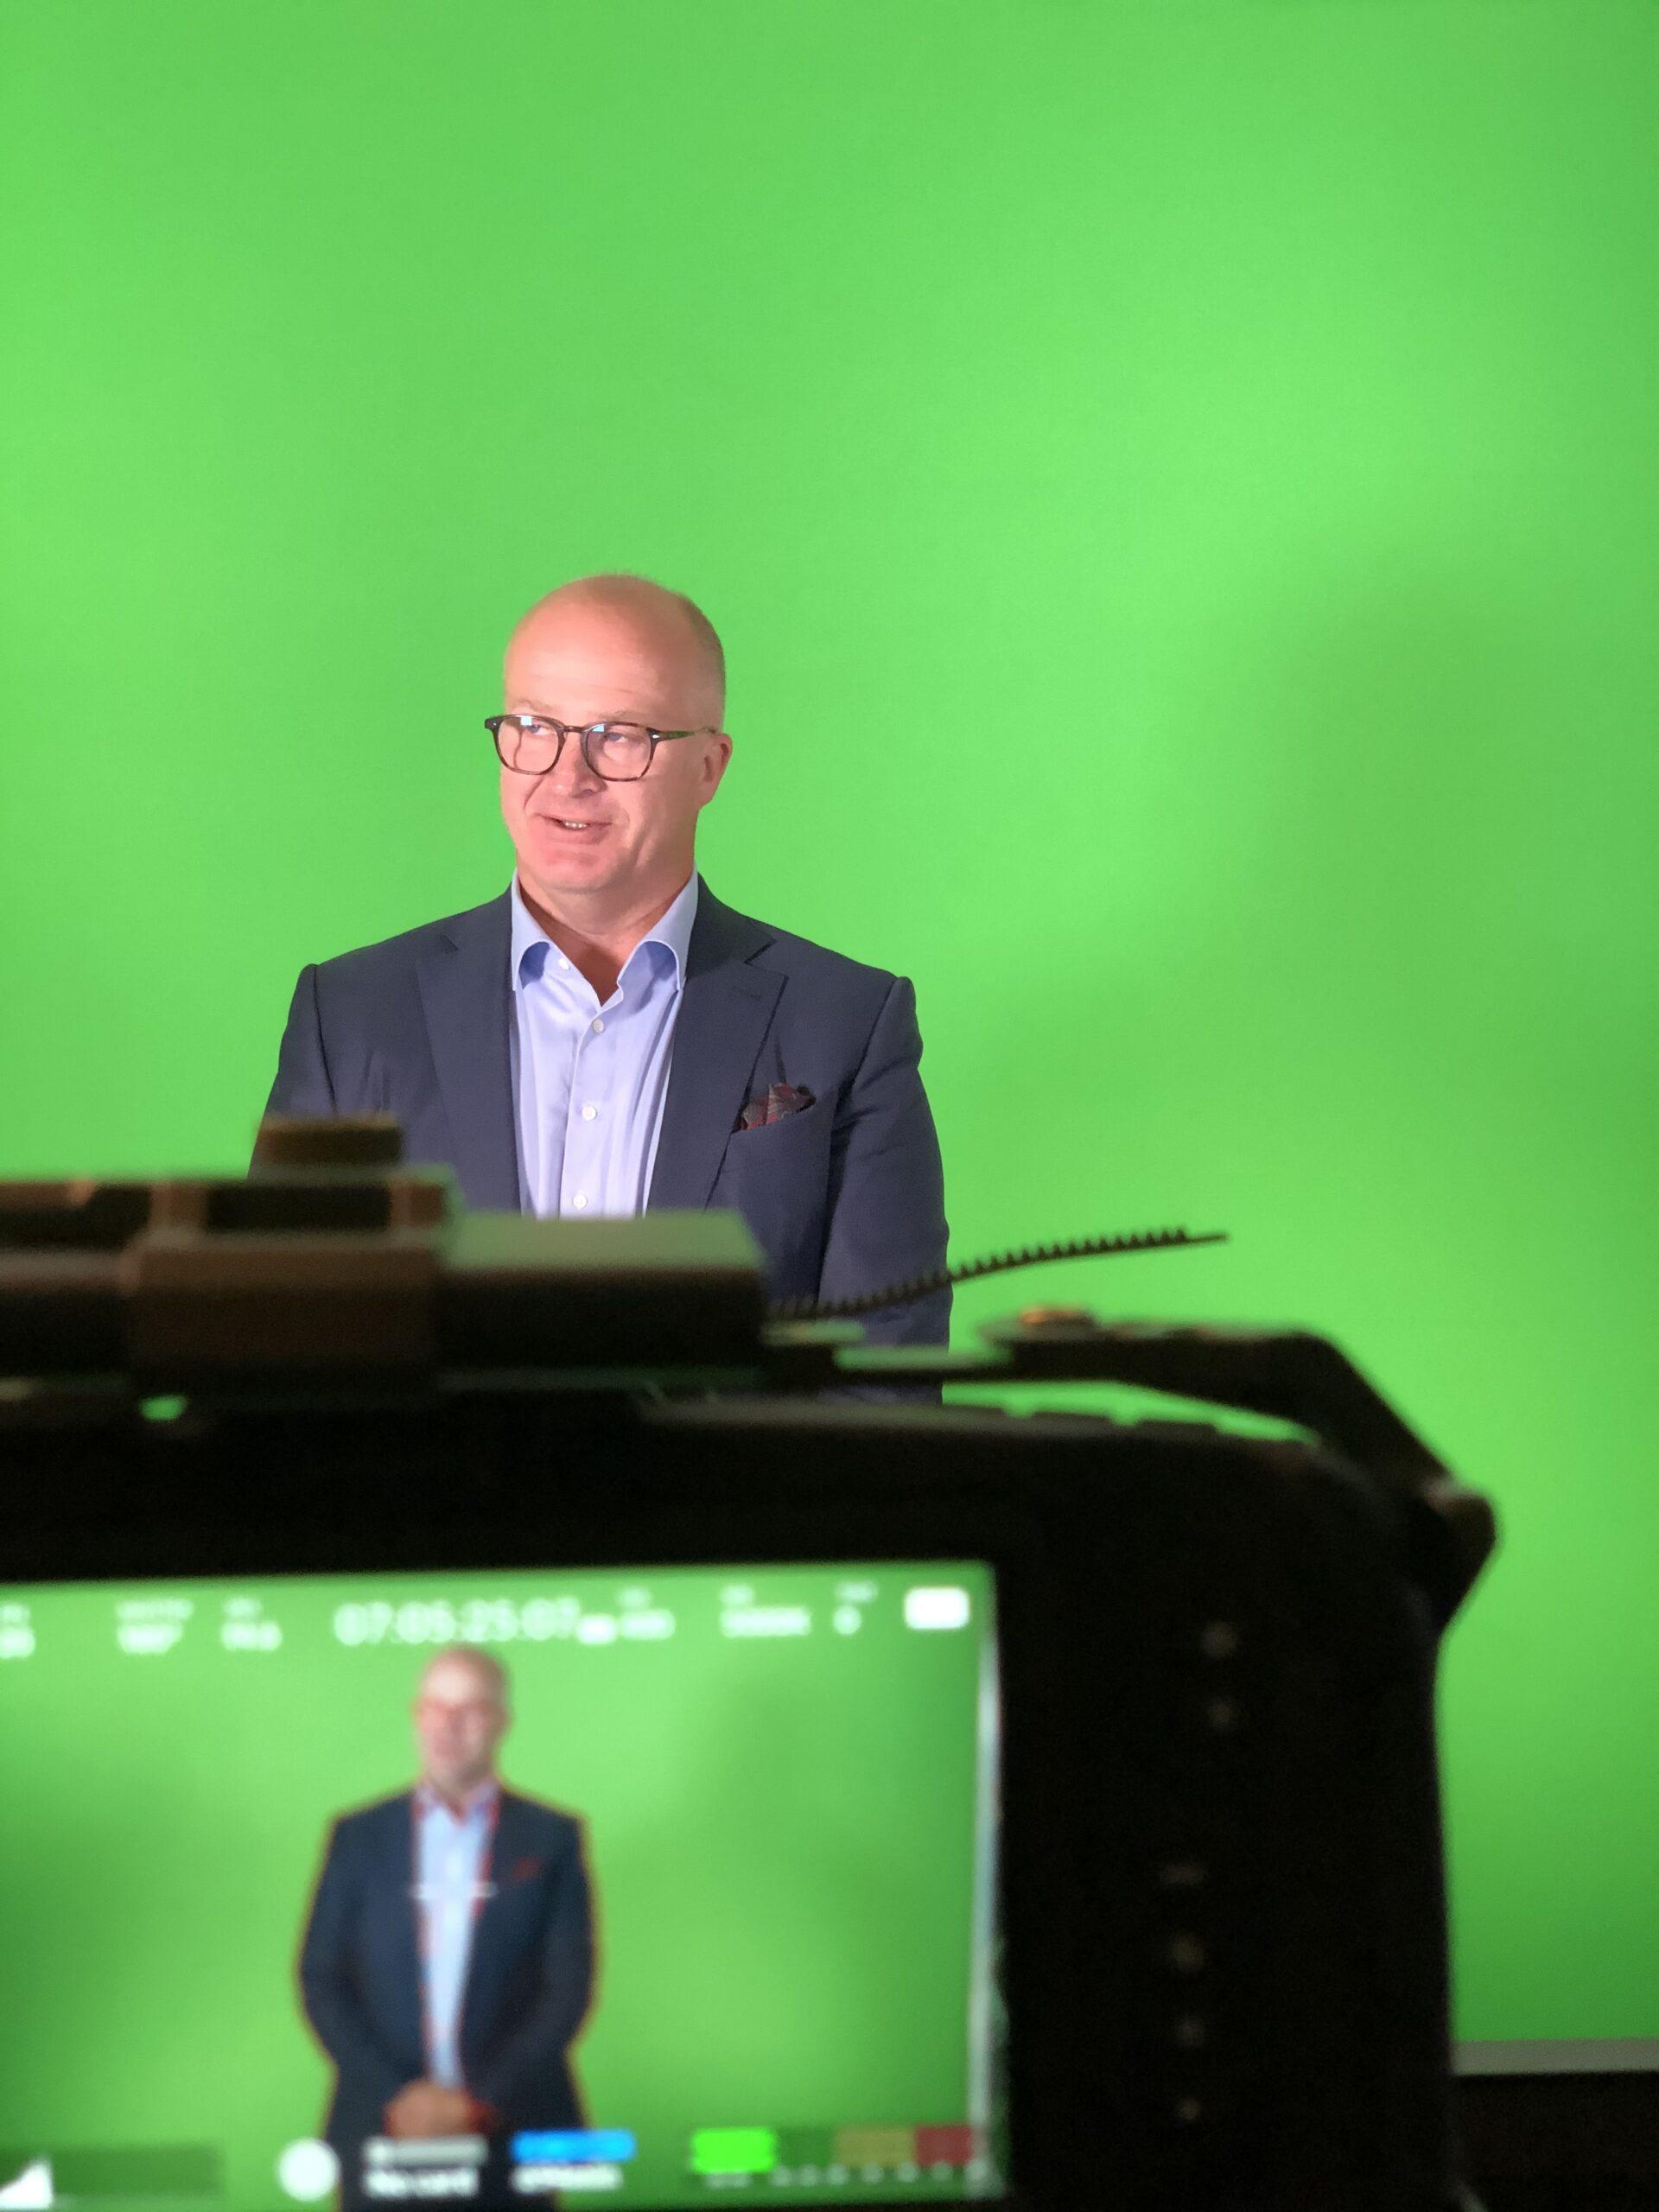 Green screen studio eKurs Norge